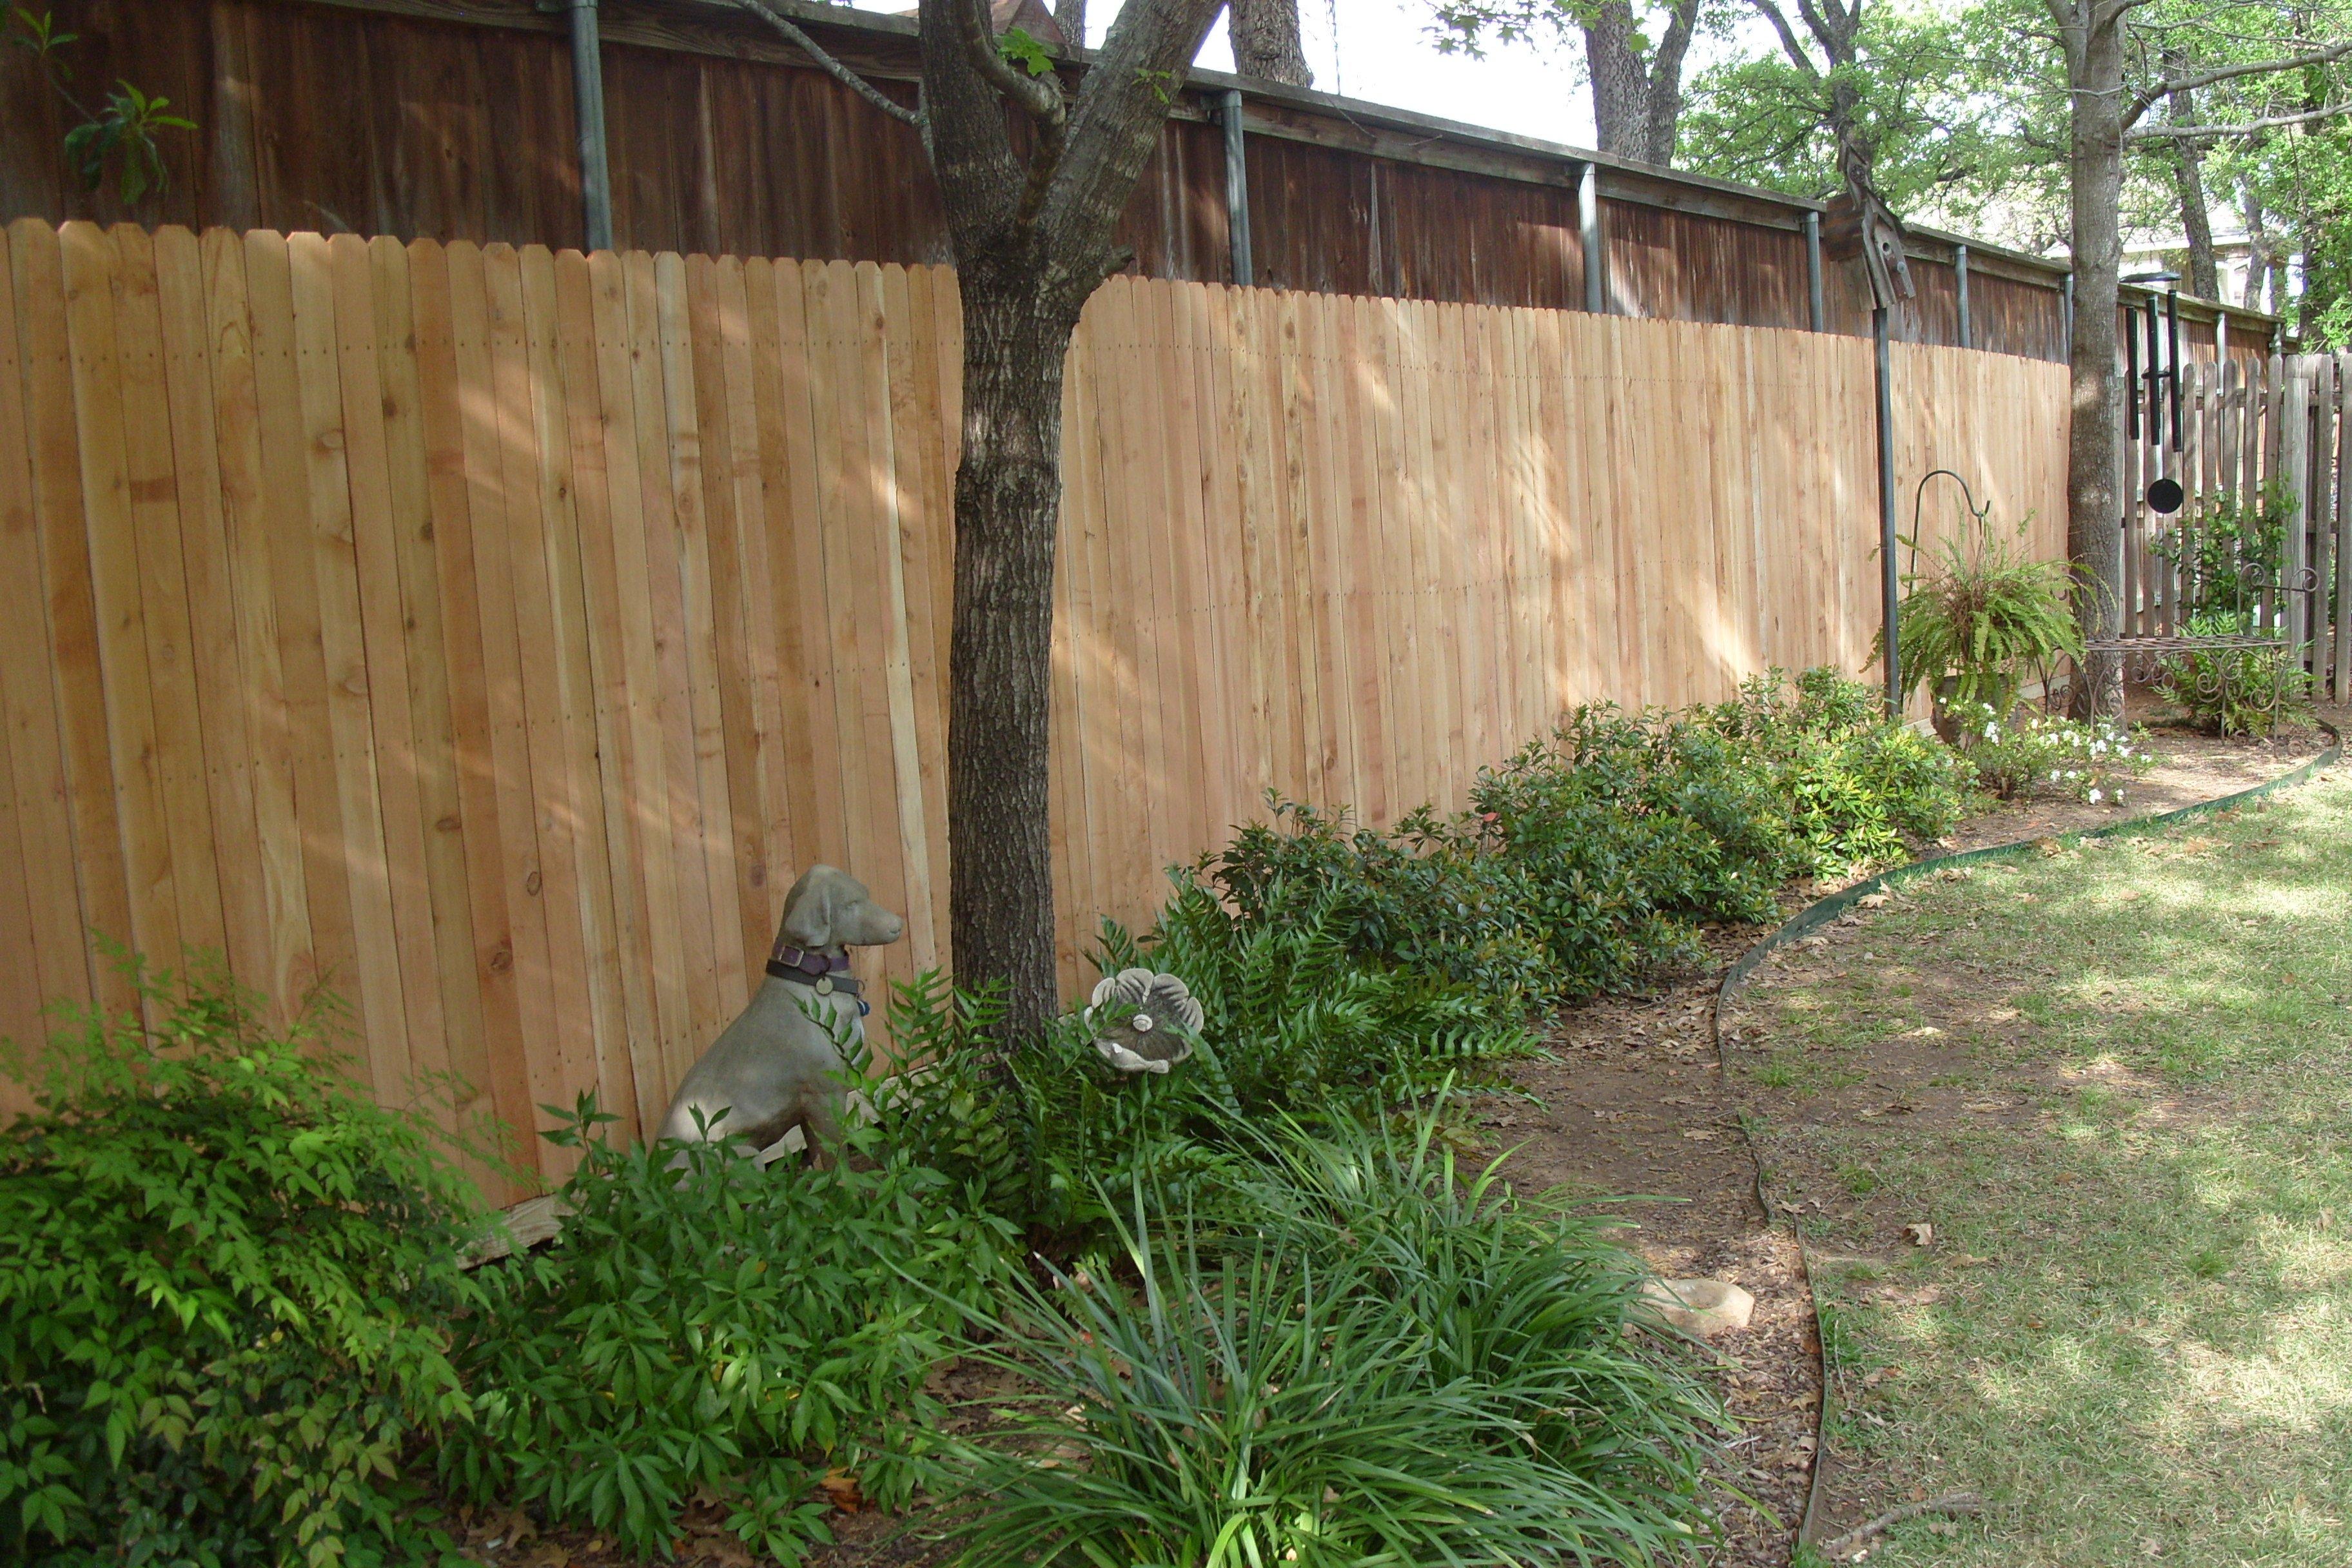 Newly Built Fence